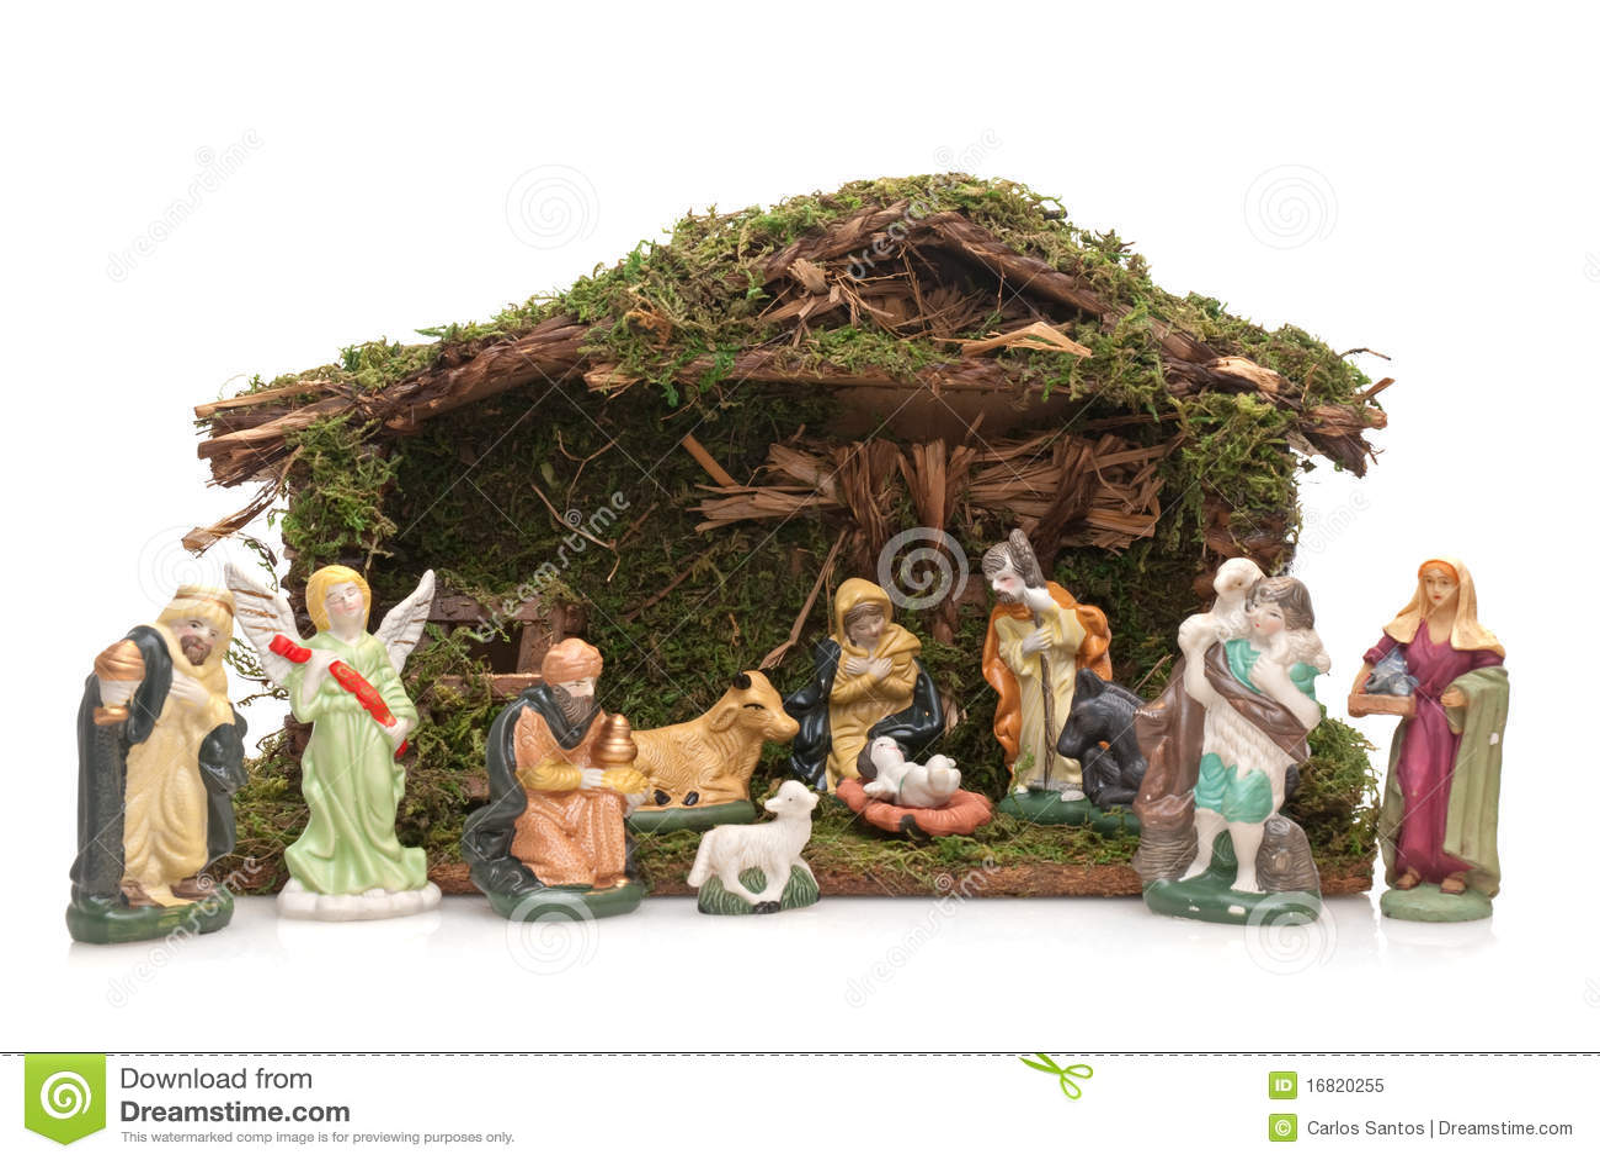 Christmas Crib Isolated On White Background Royalty Free Stock Photo